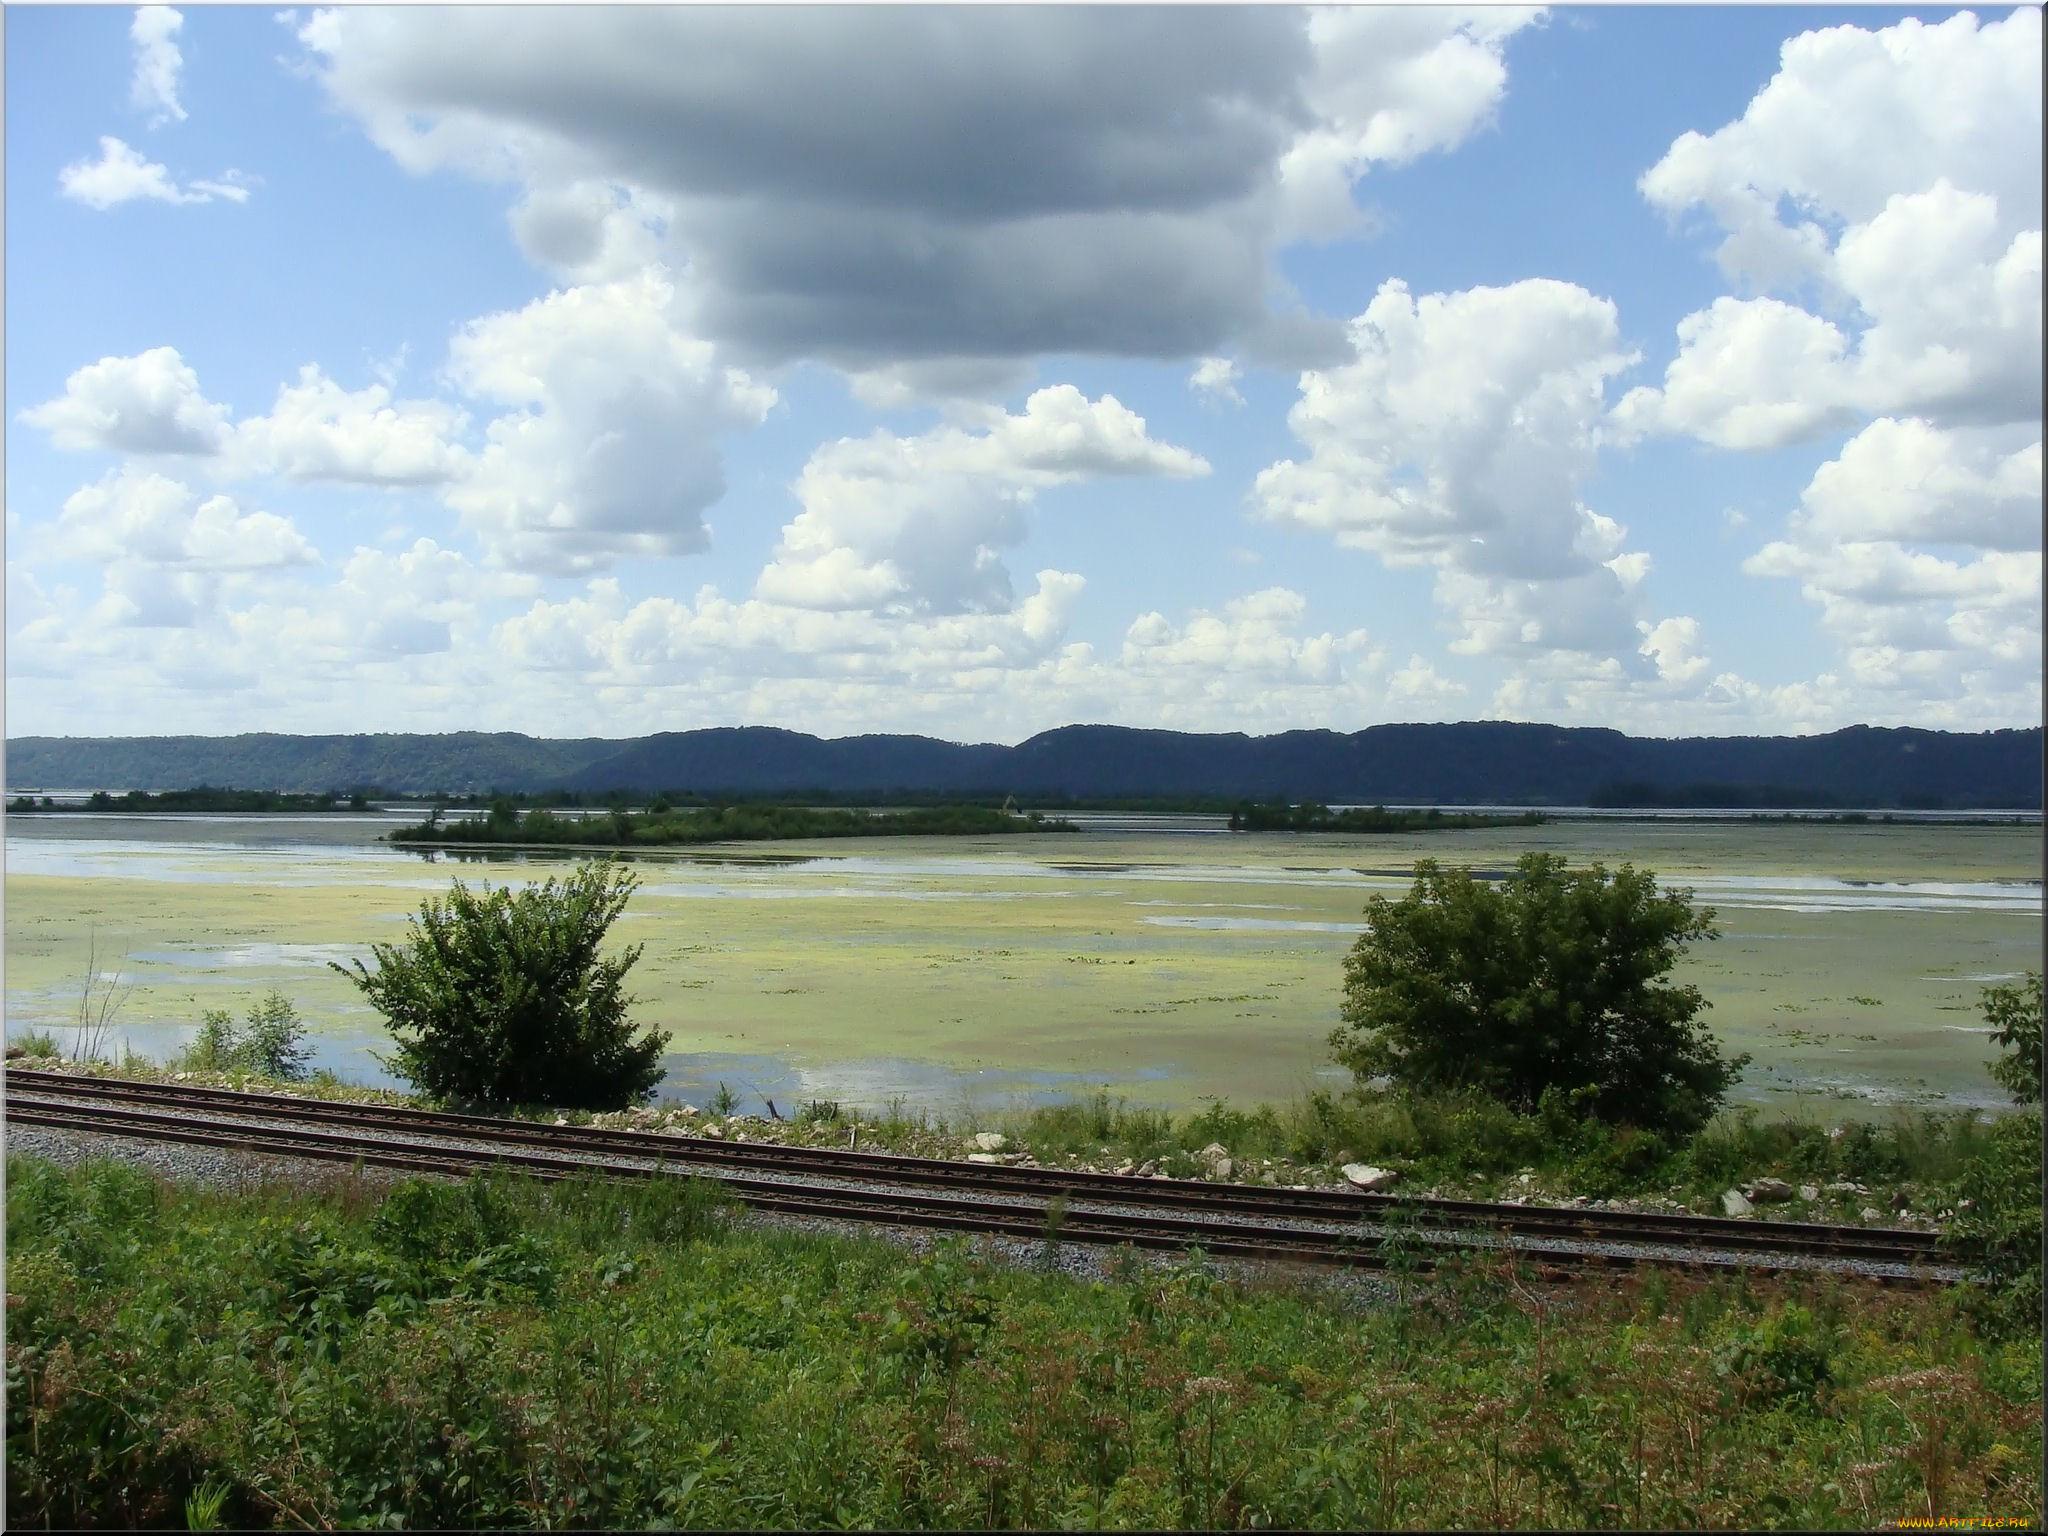 природа, дороги, железная, дорога, озеро